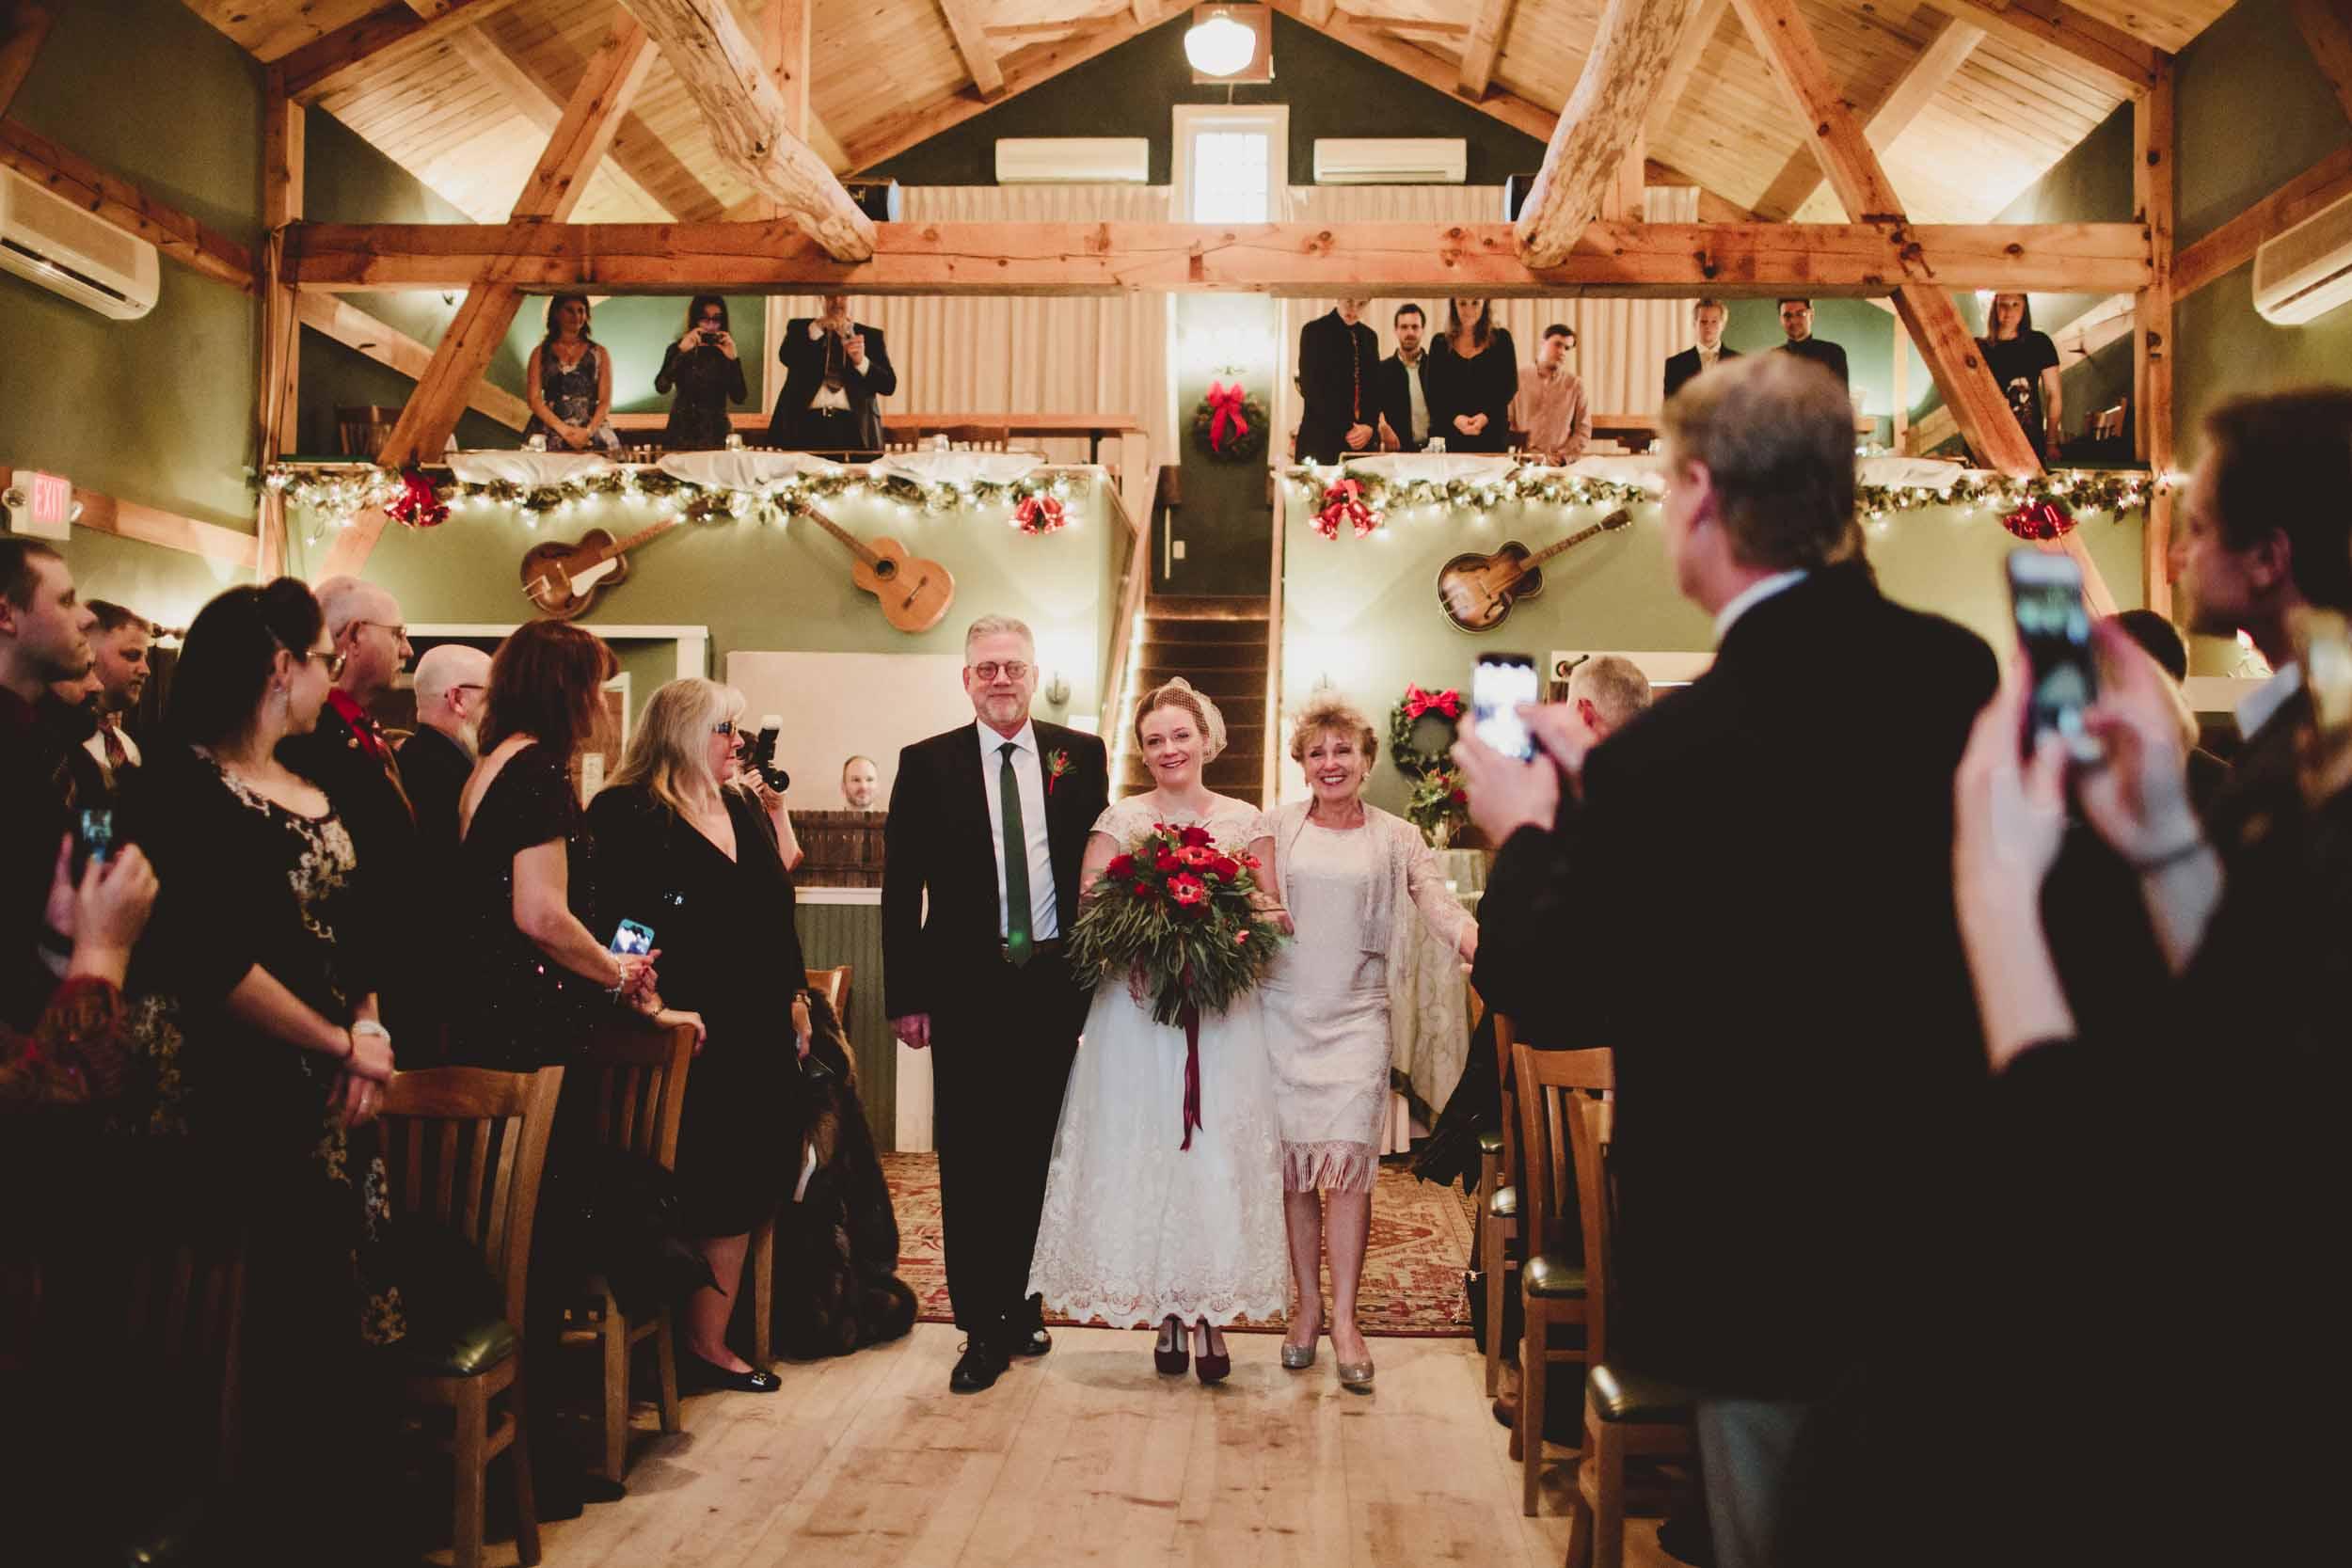 Stone-mountain-arts-wedding43.jpg